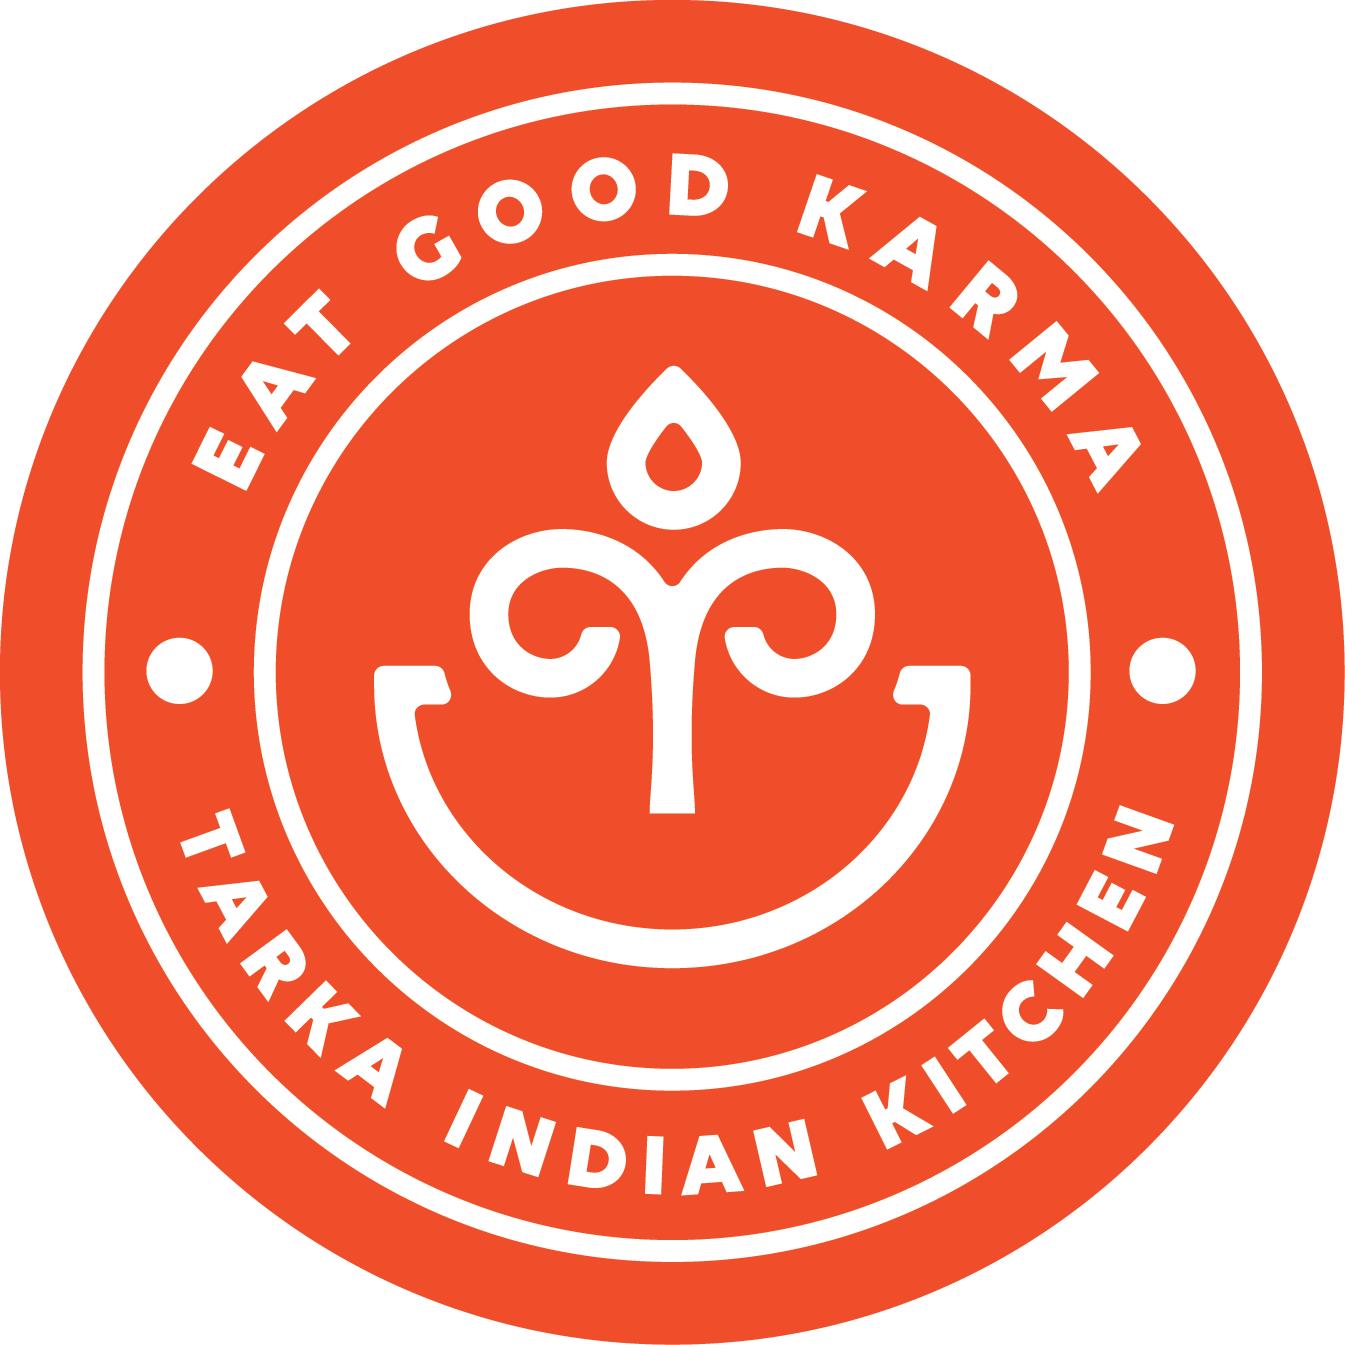 Tarka Indian Kitchen (North Cross) Logo